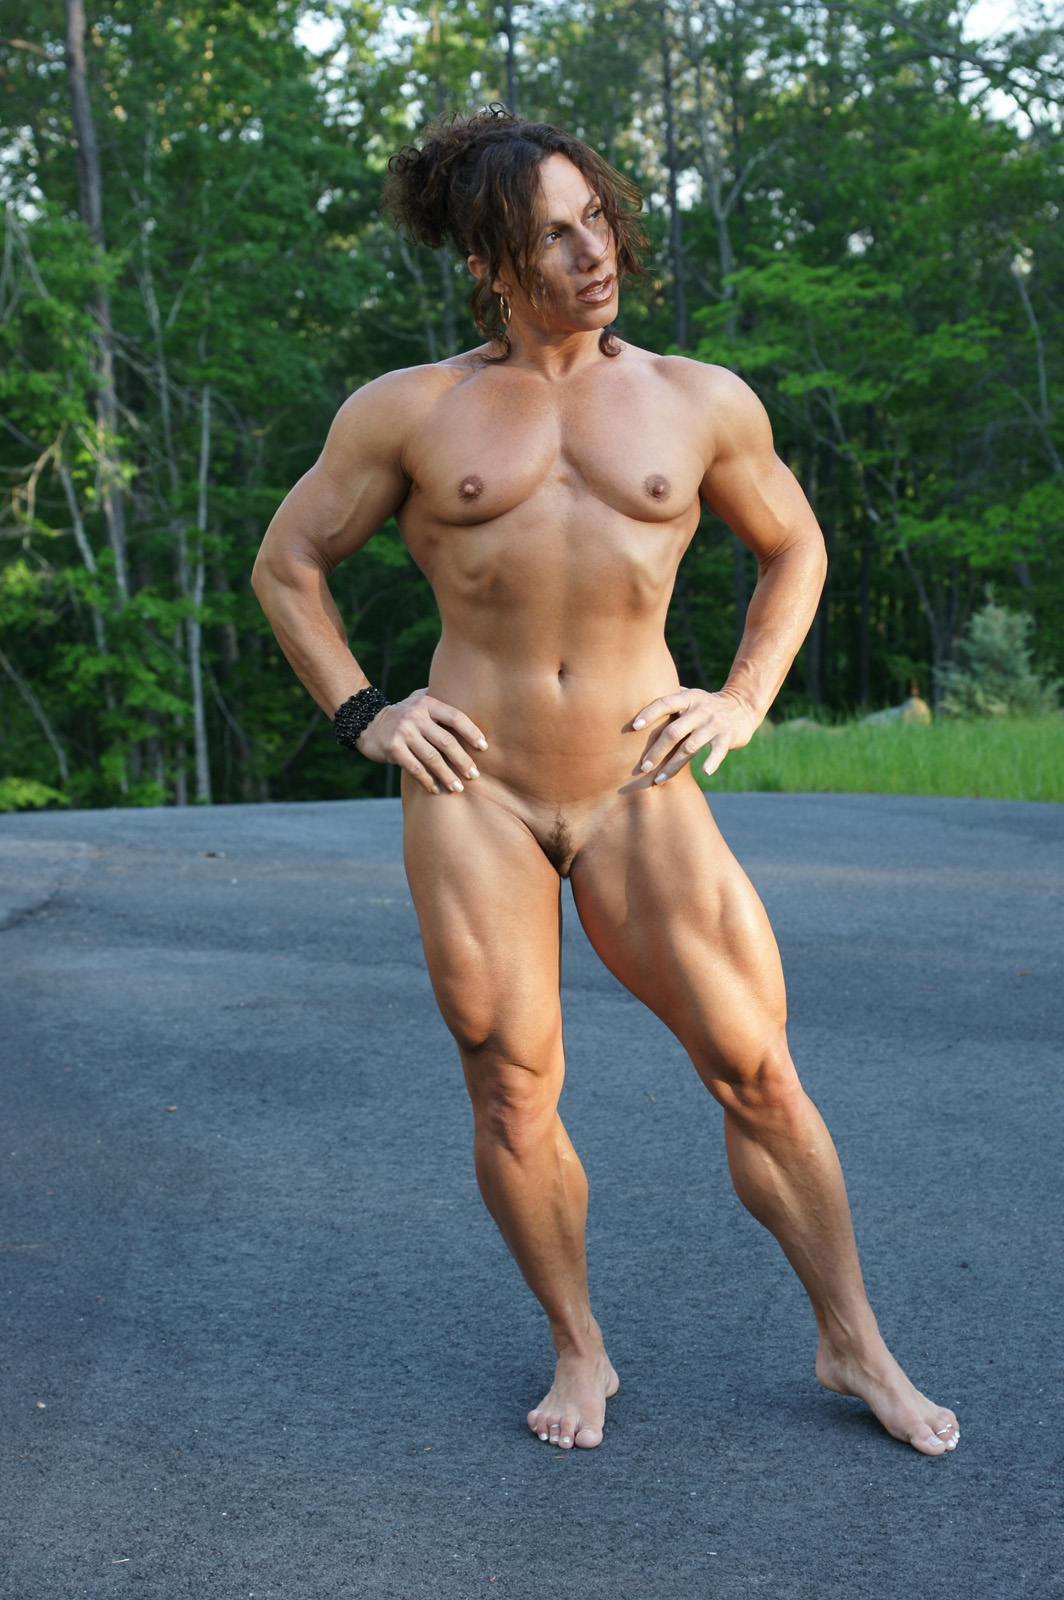 Free mature female muscle nude muscular women